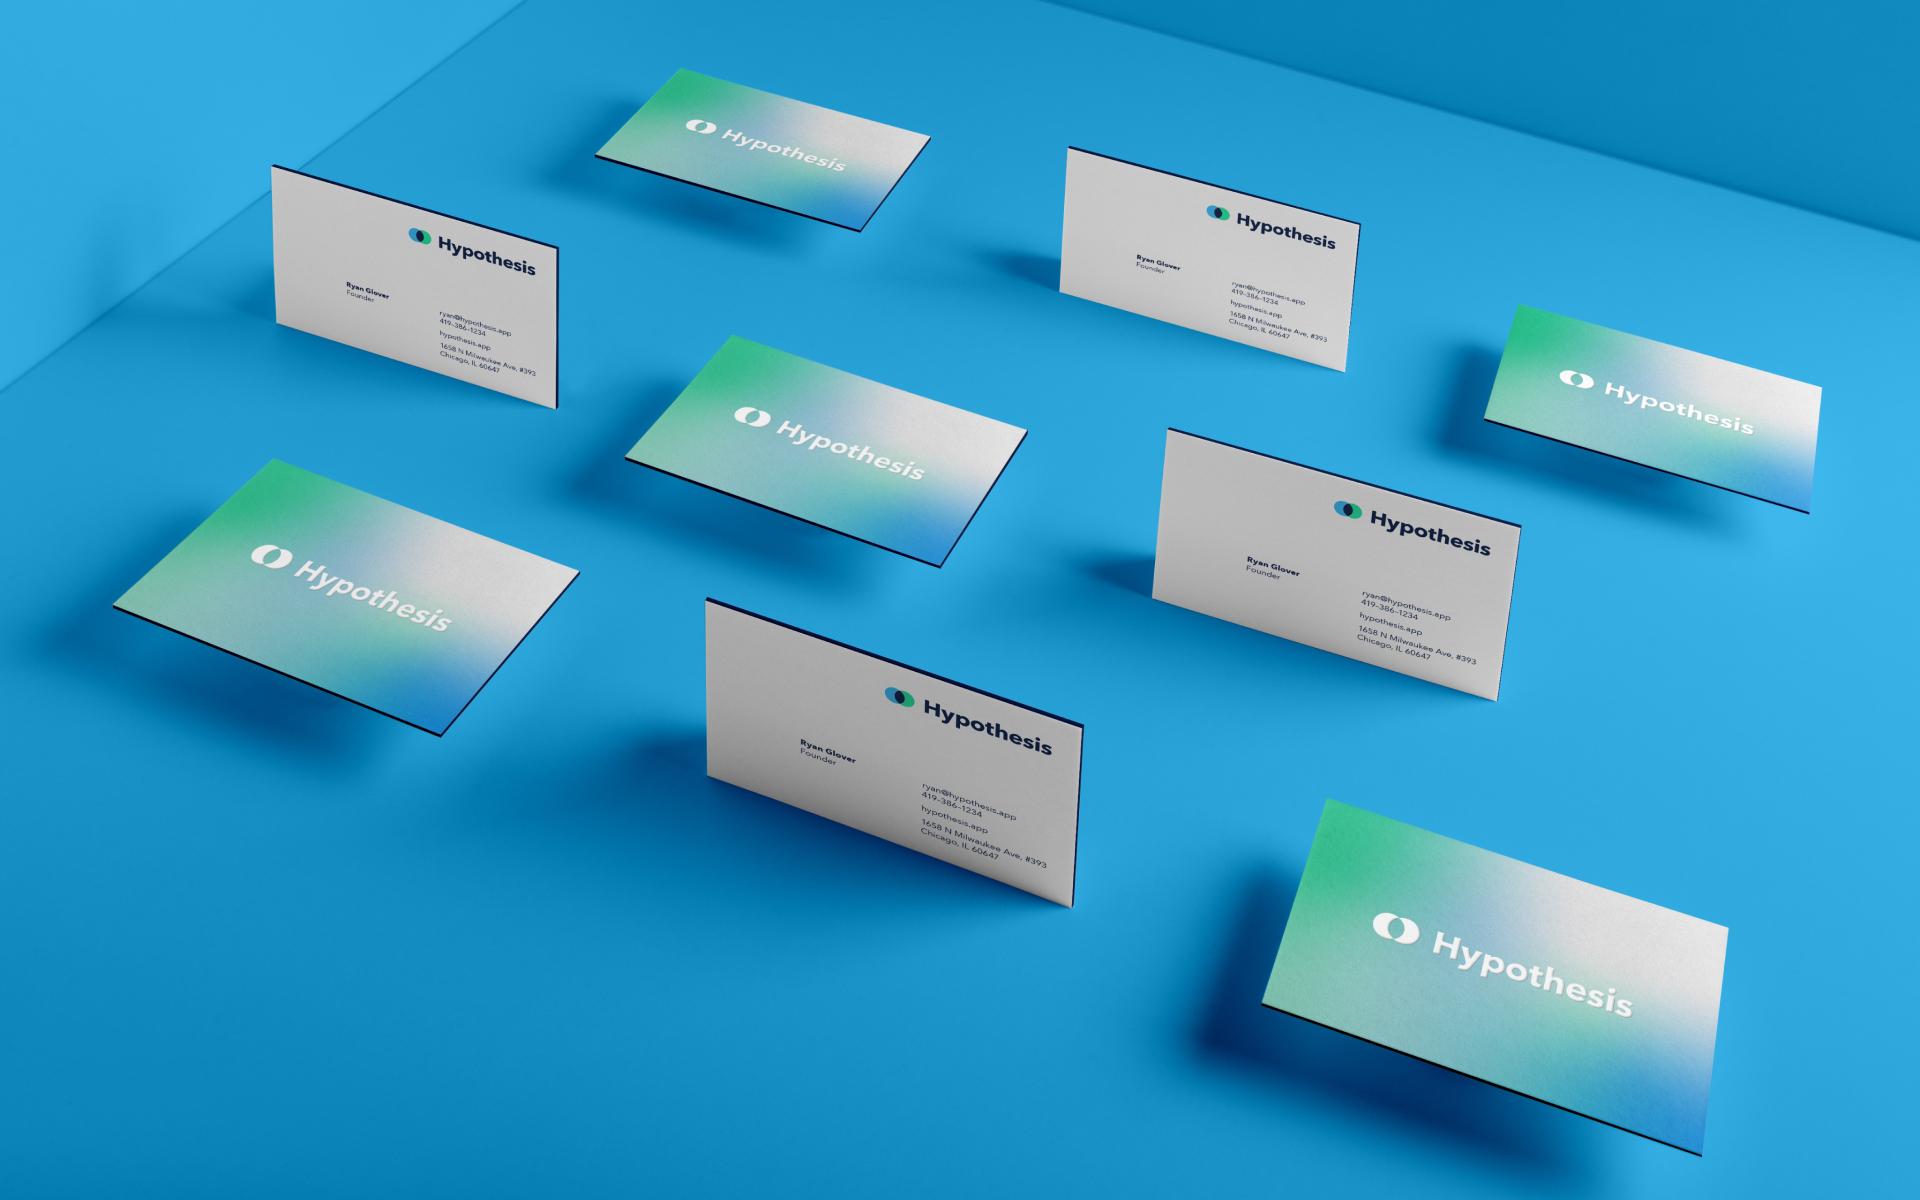 Hypothesis B2B SaaS startup branding